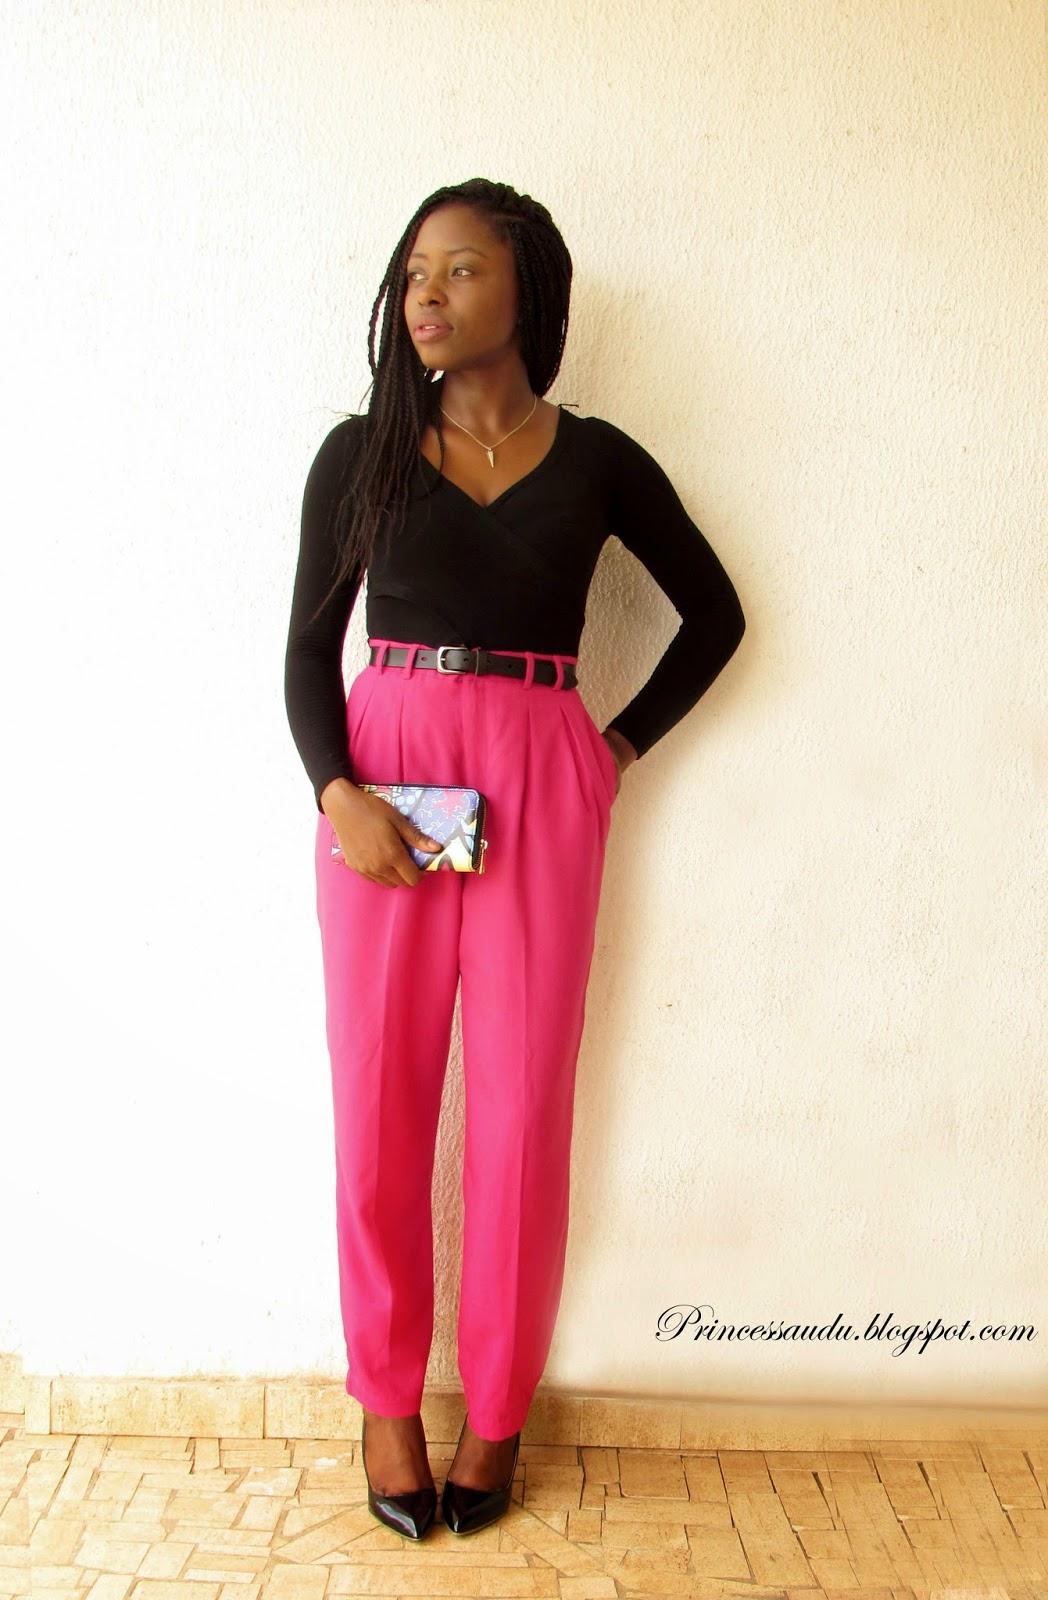 high-waist trousers, black pumps, pink, vintage, date night